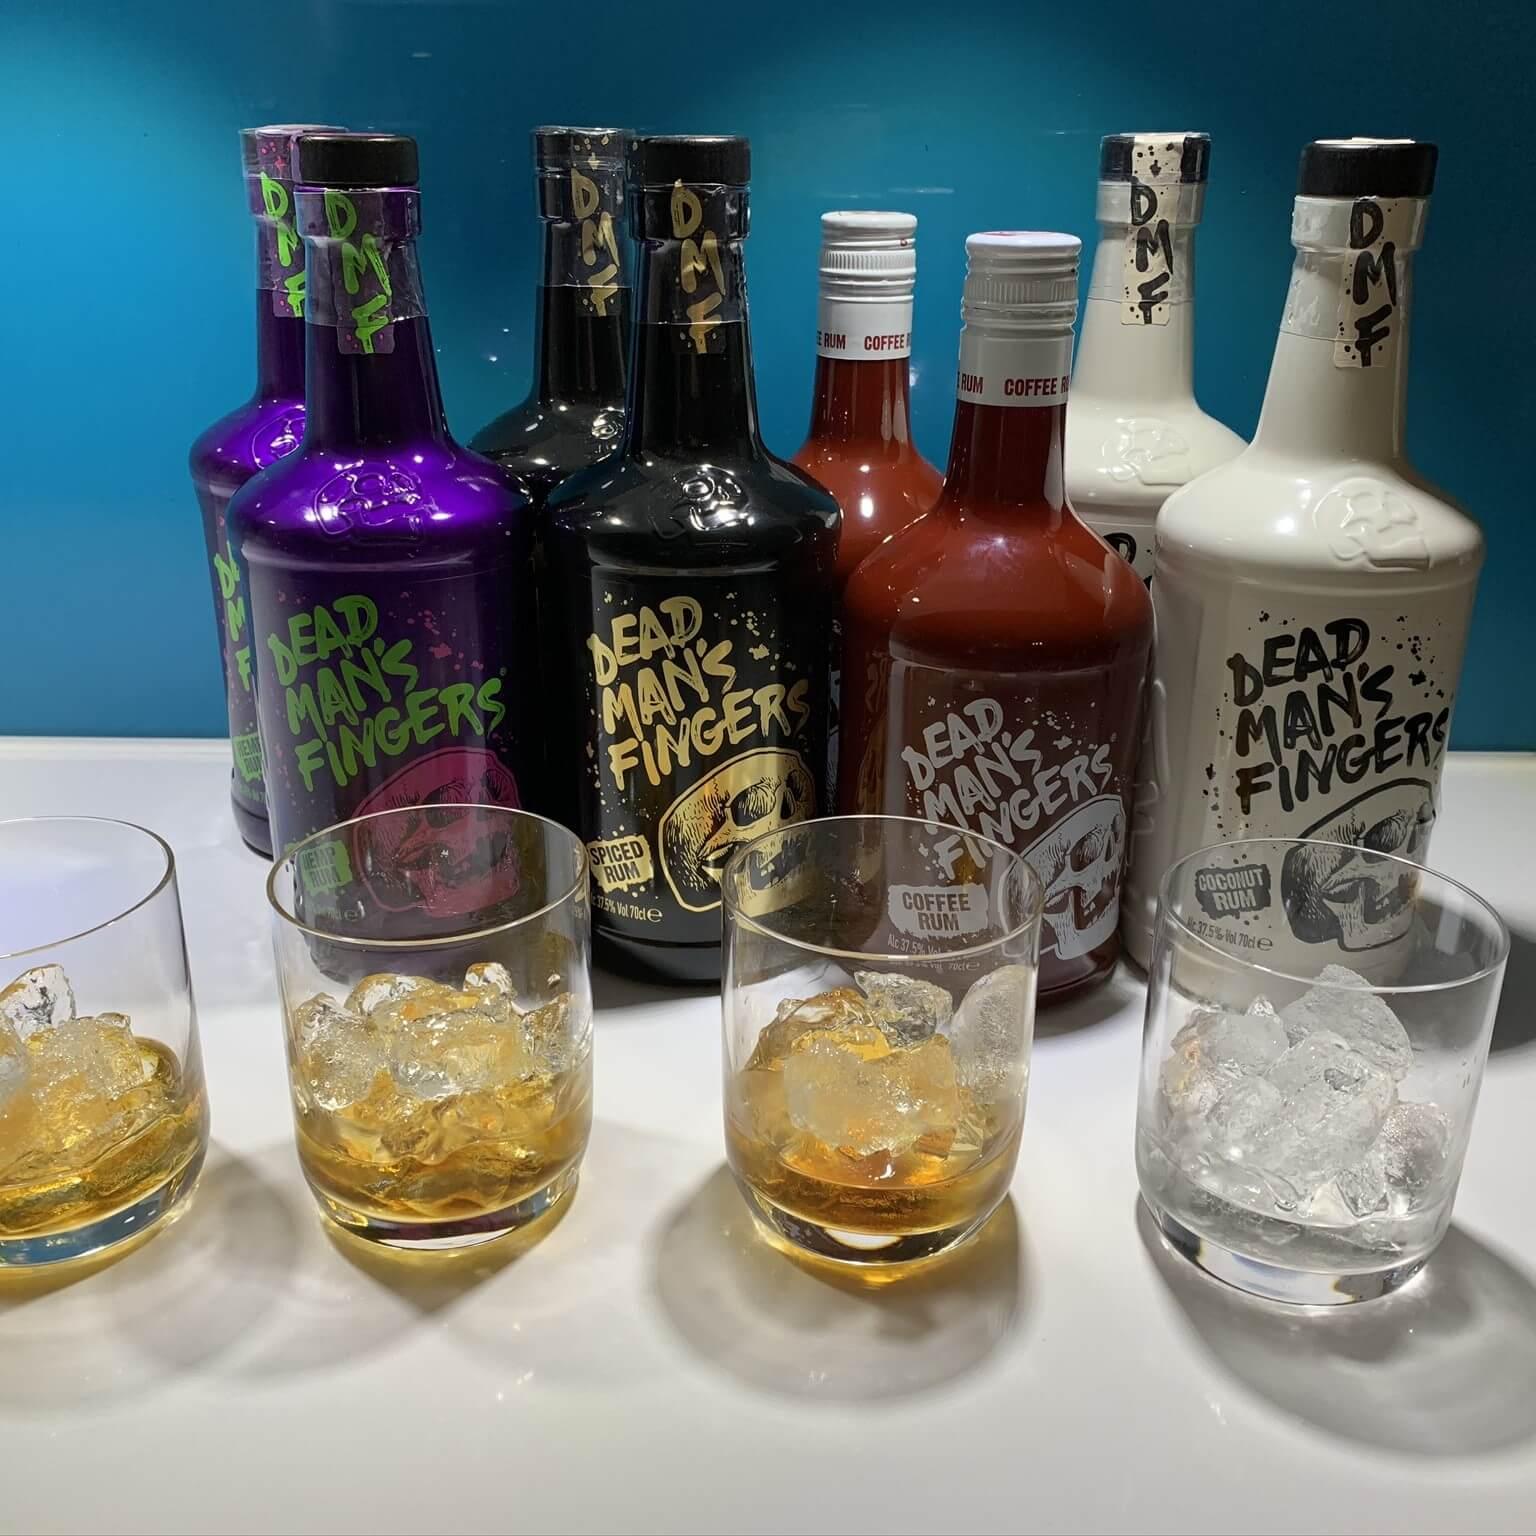 Dead Man's Fingers Rum